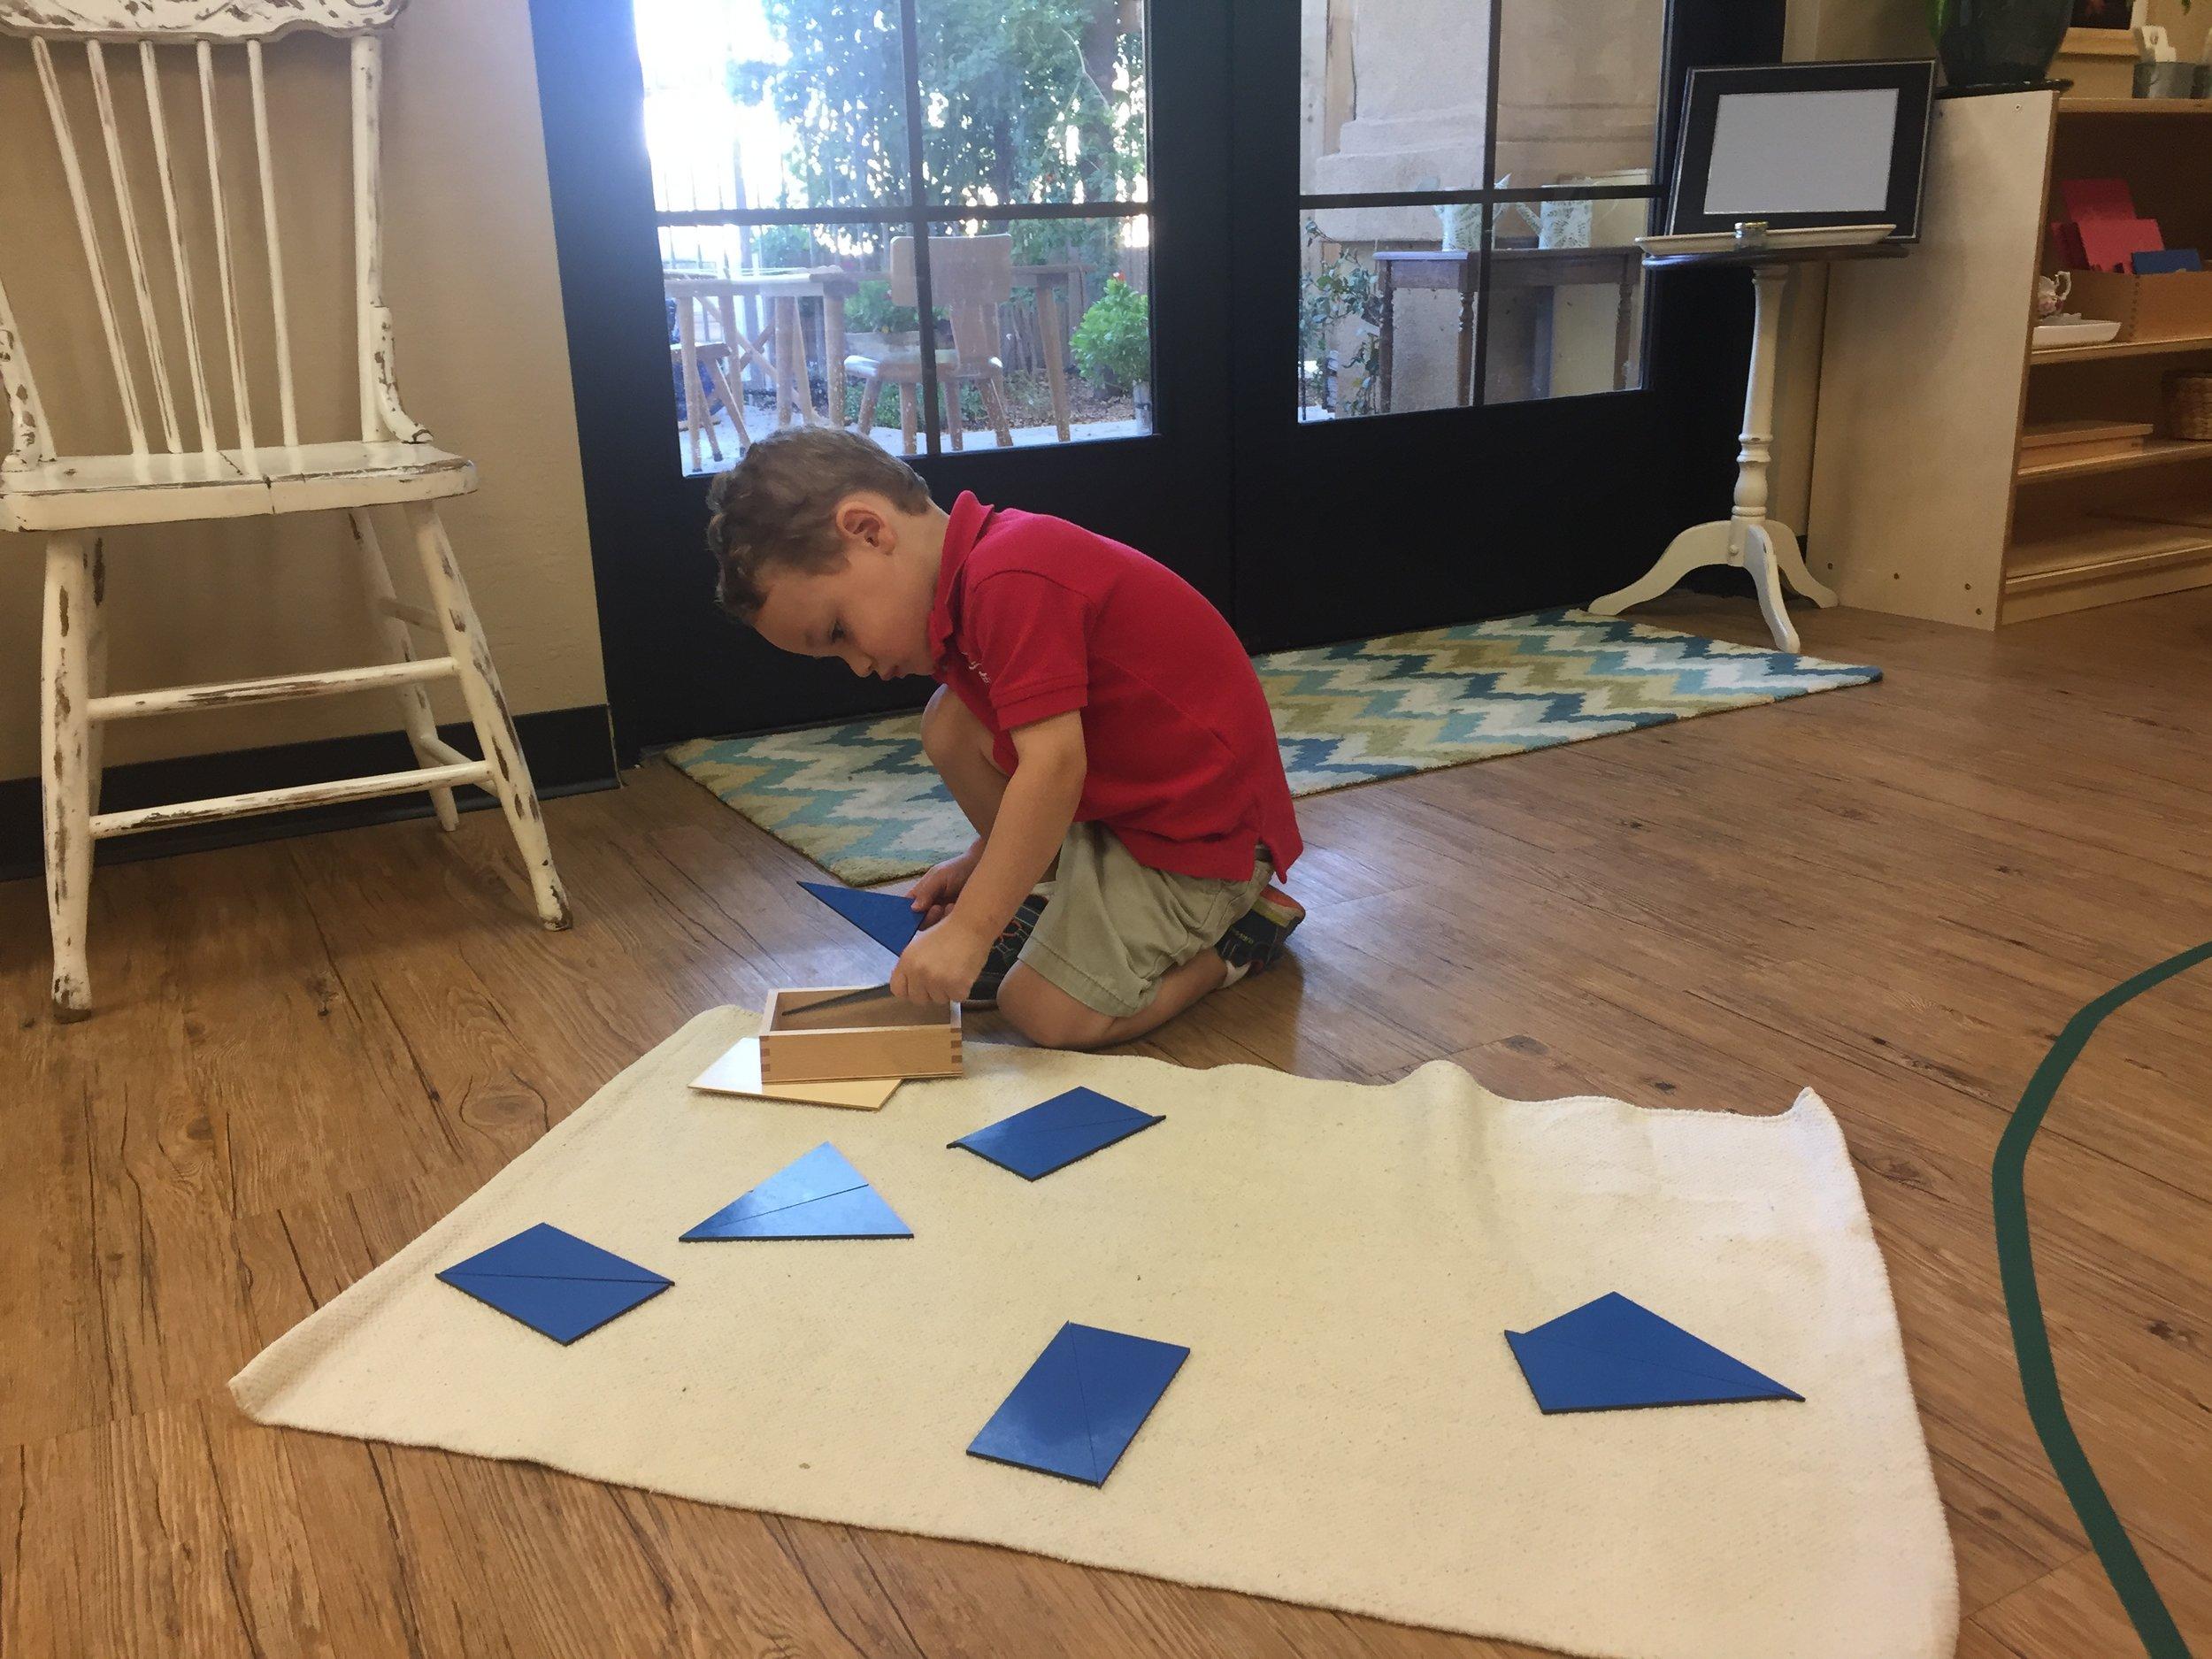 Blue identical triangles